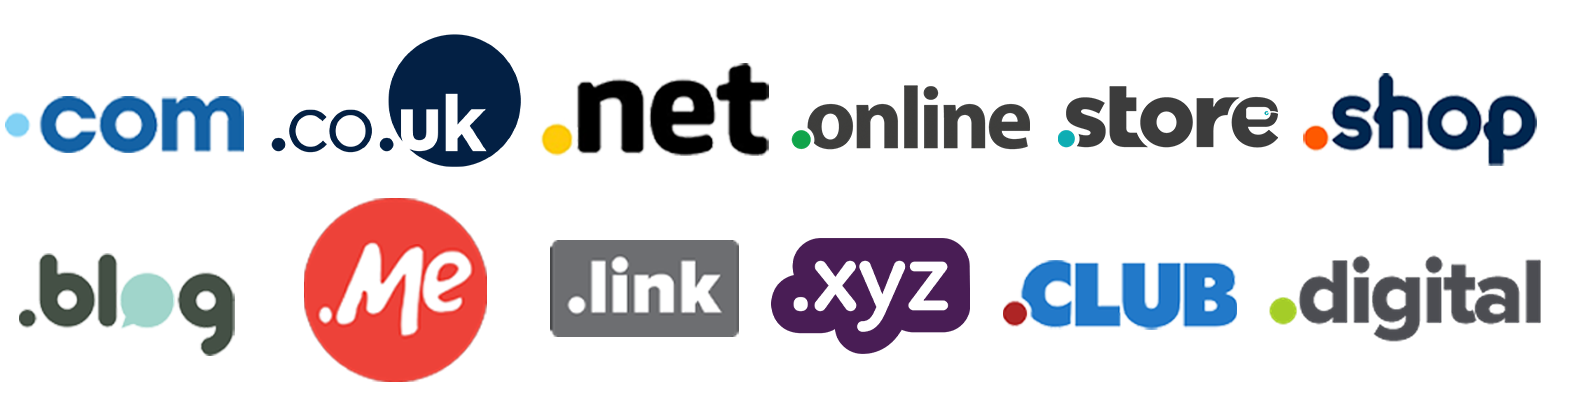 arab4ws.com-domains